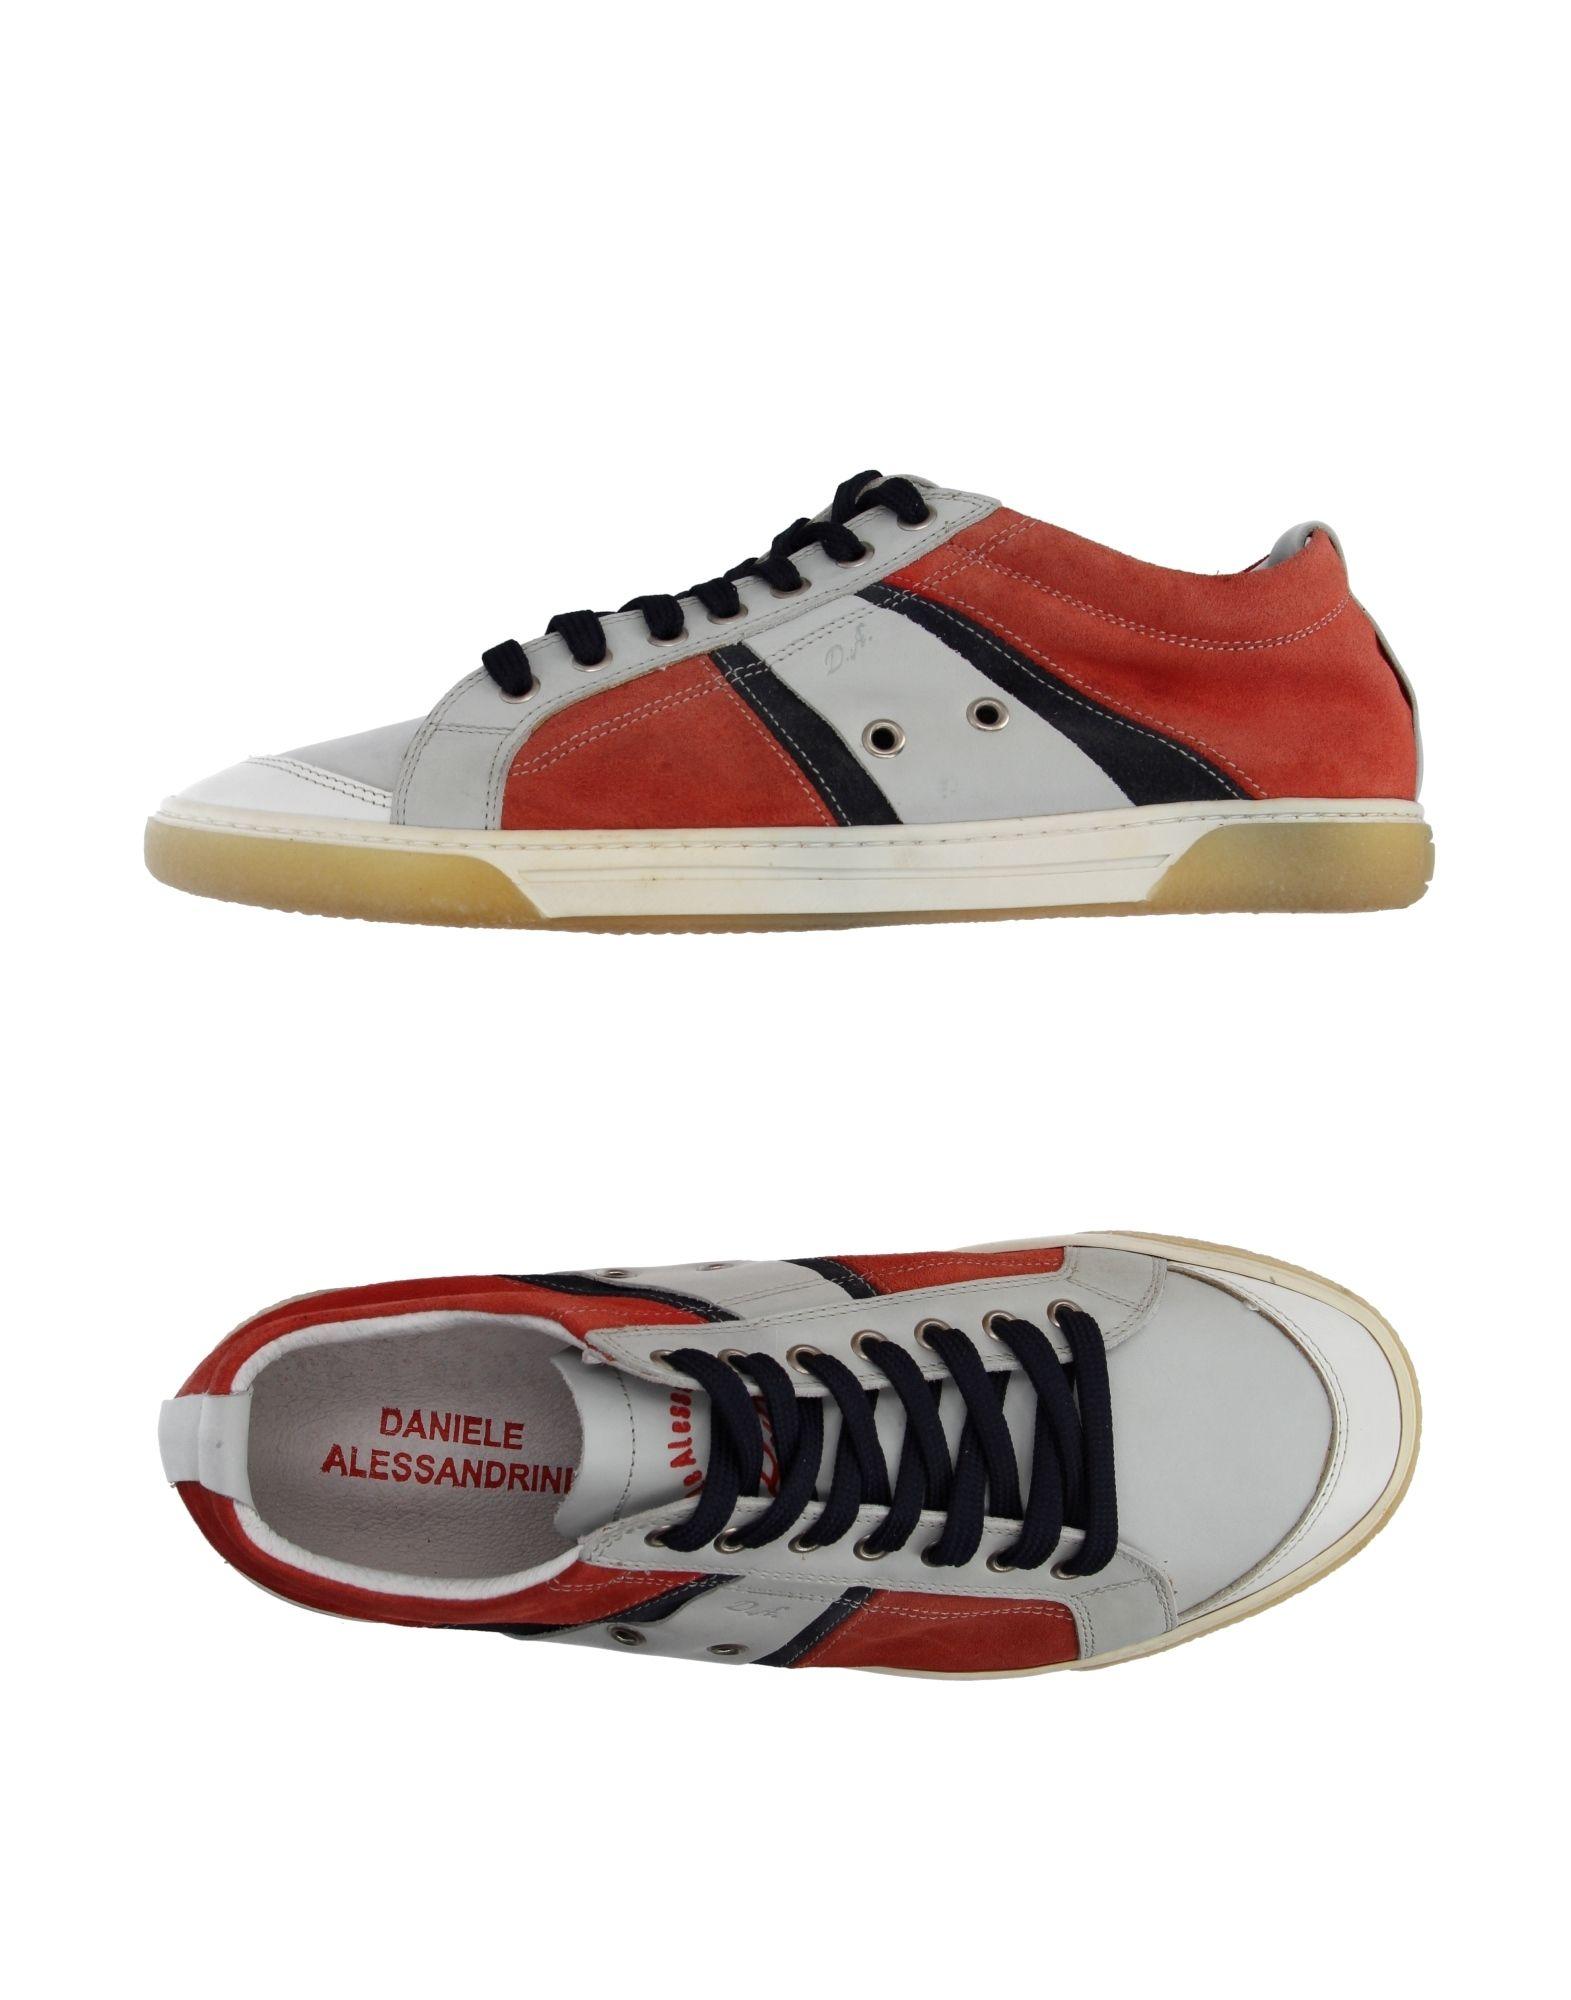 Daniele Alessandrini Sneakers 11028145IB Herren  11028145IB Sneakers dd3331